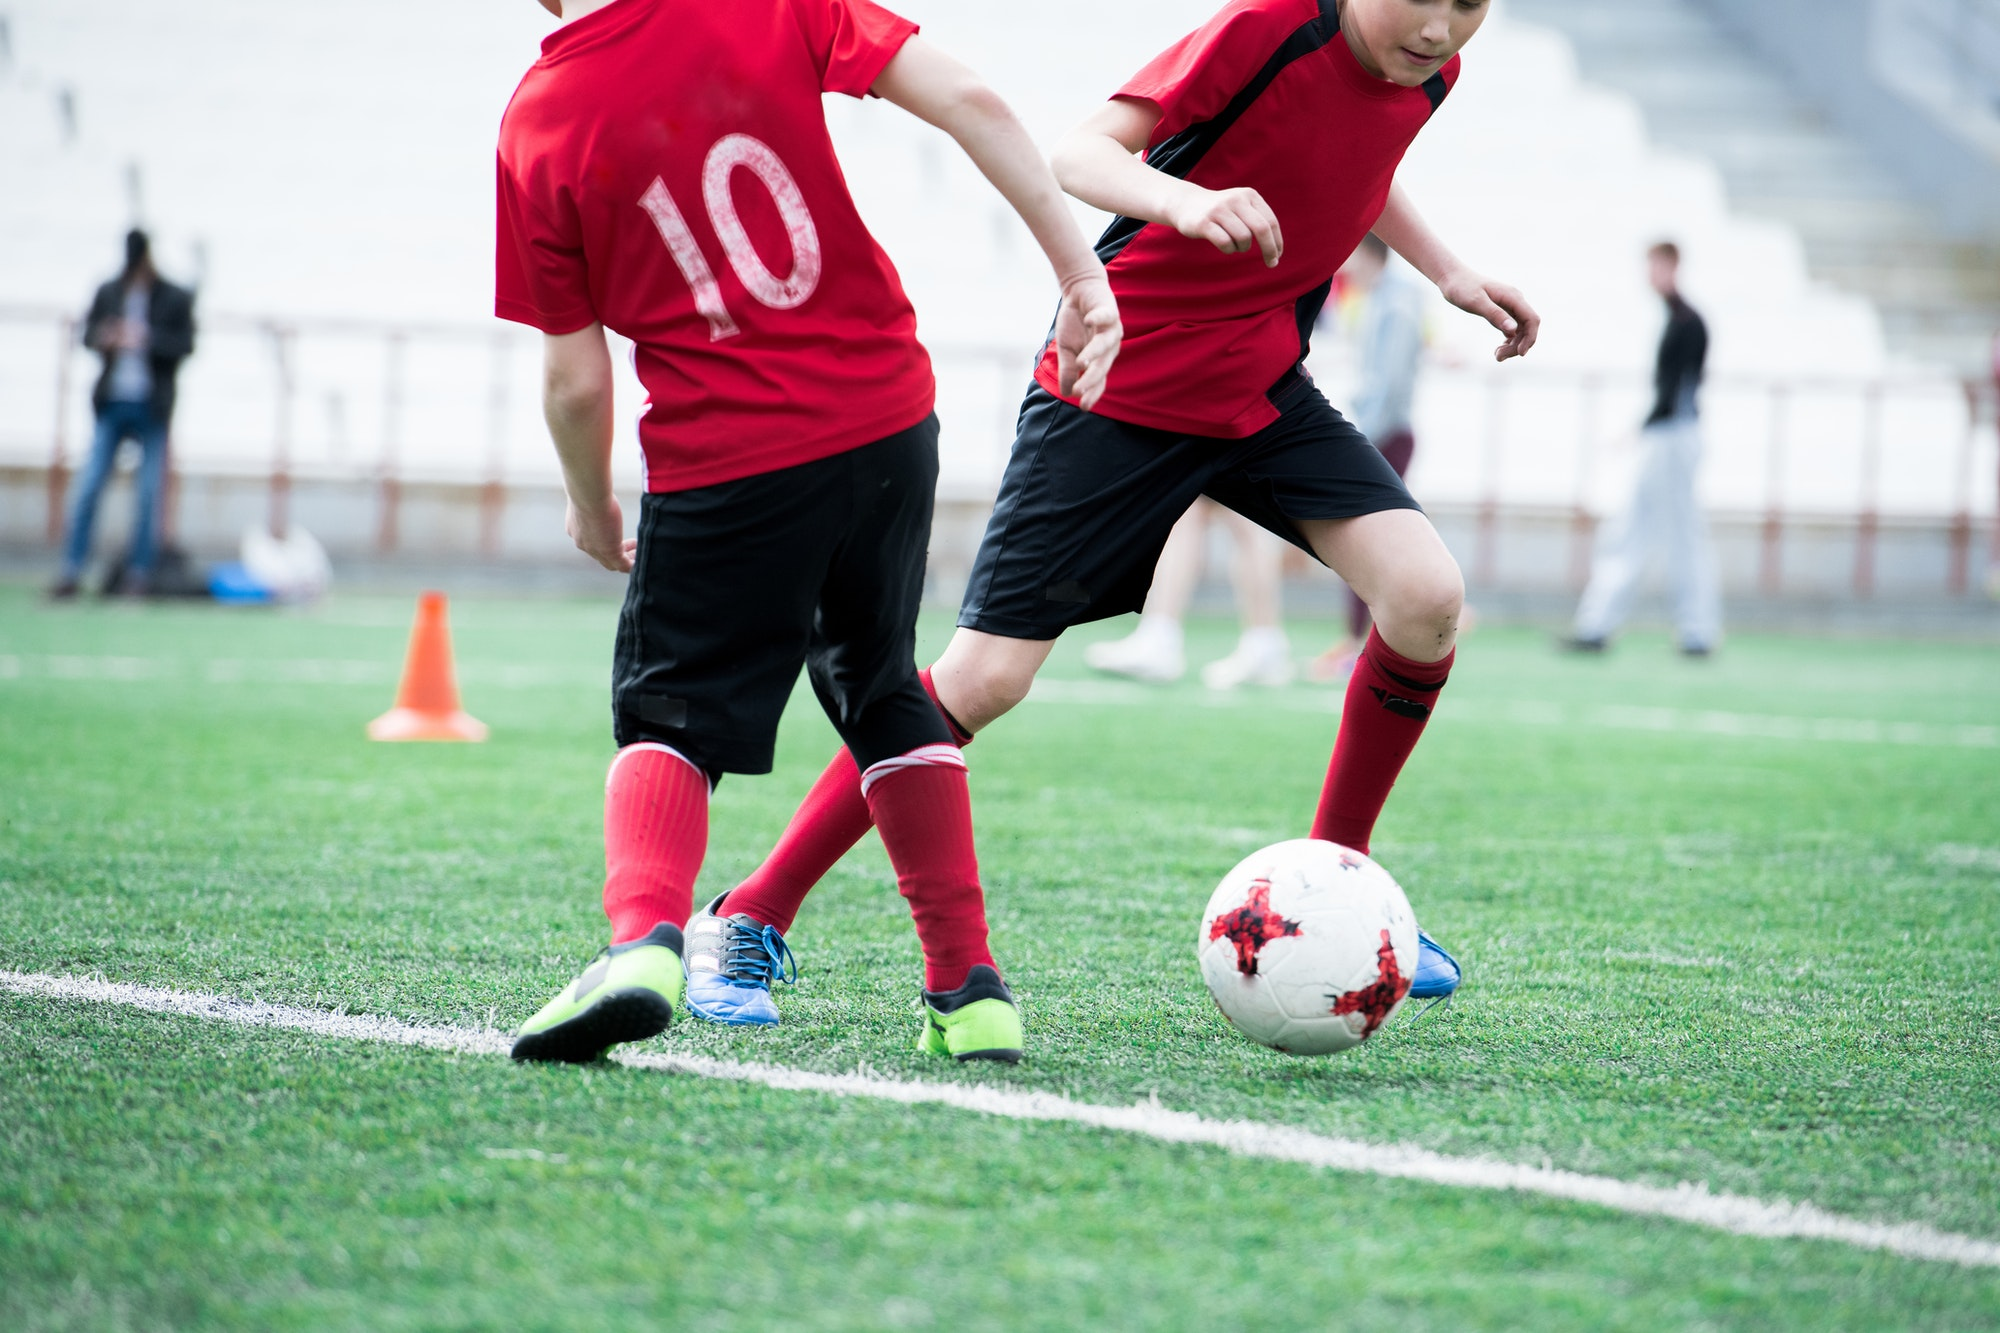 two-kids-playing-football.jpg